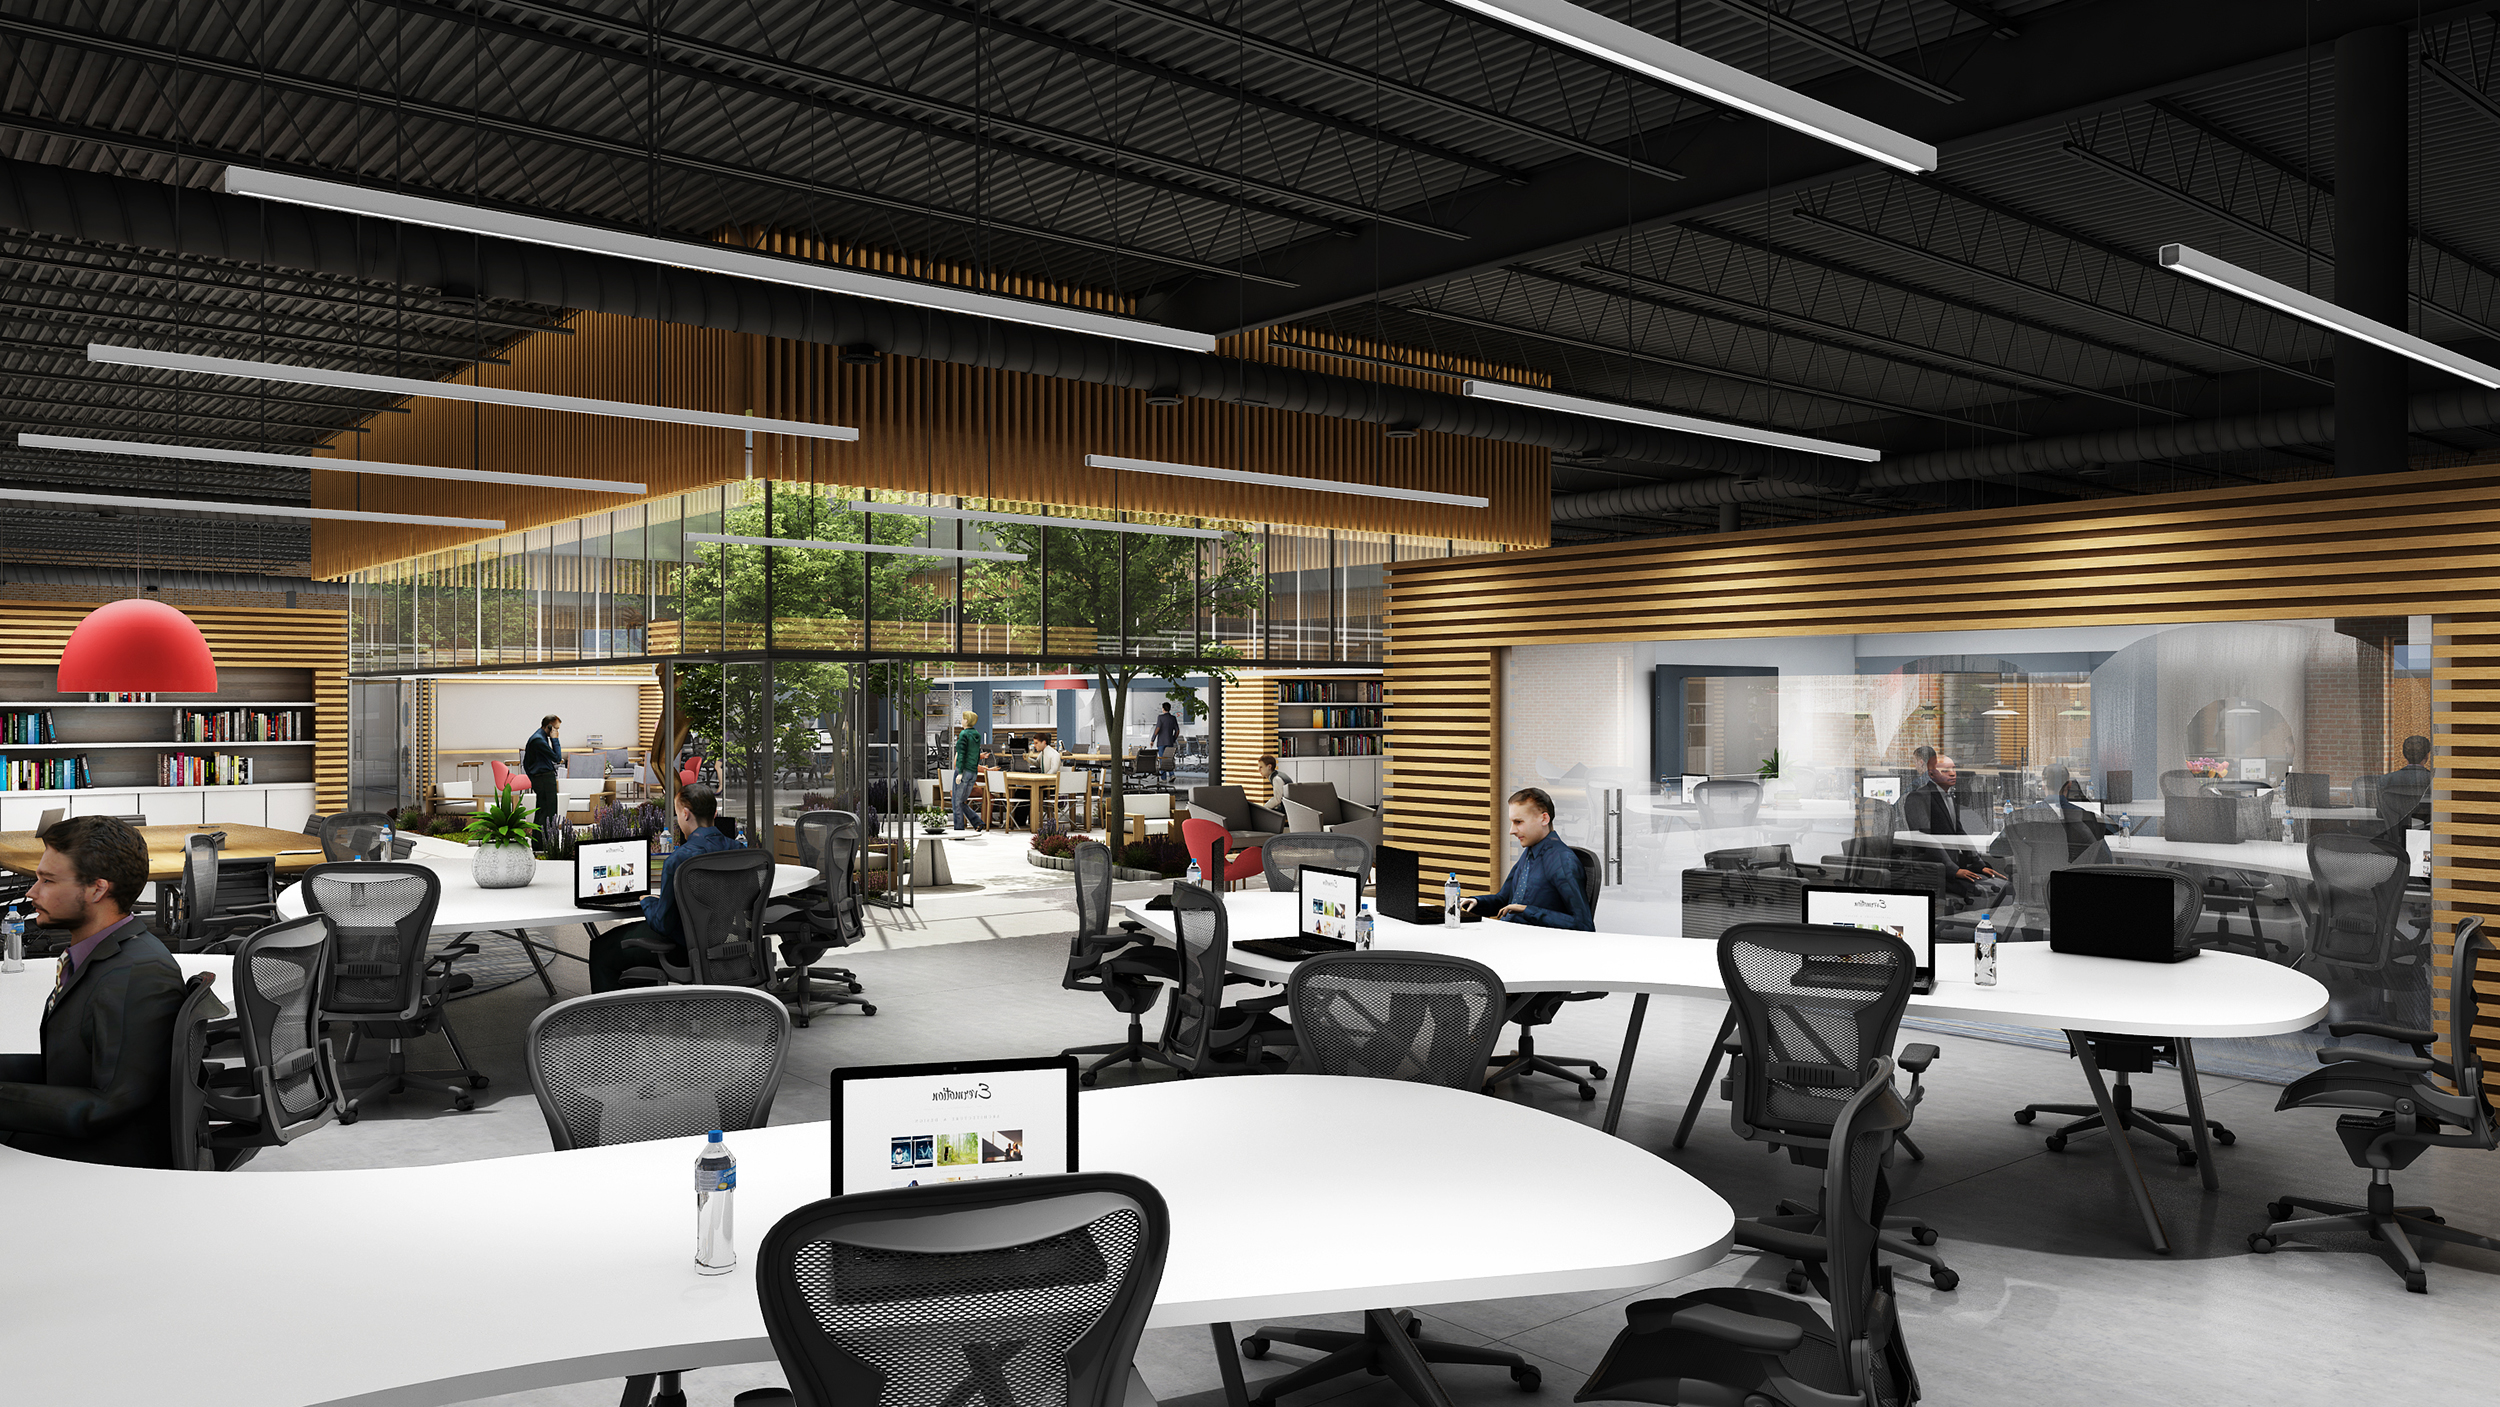 Work place area 1.jpg